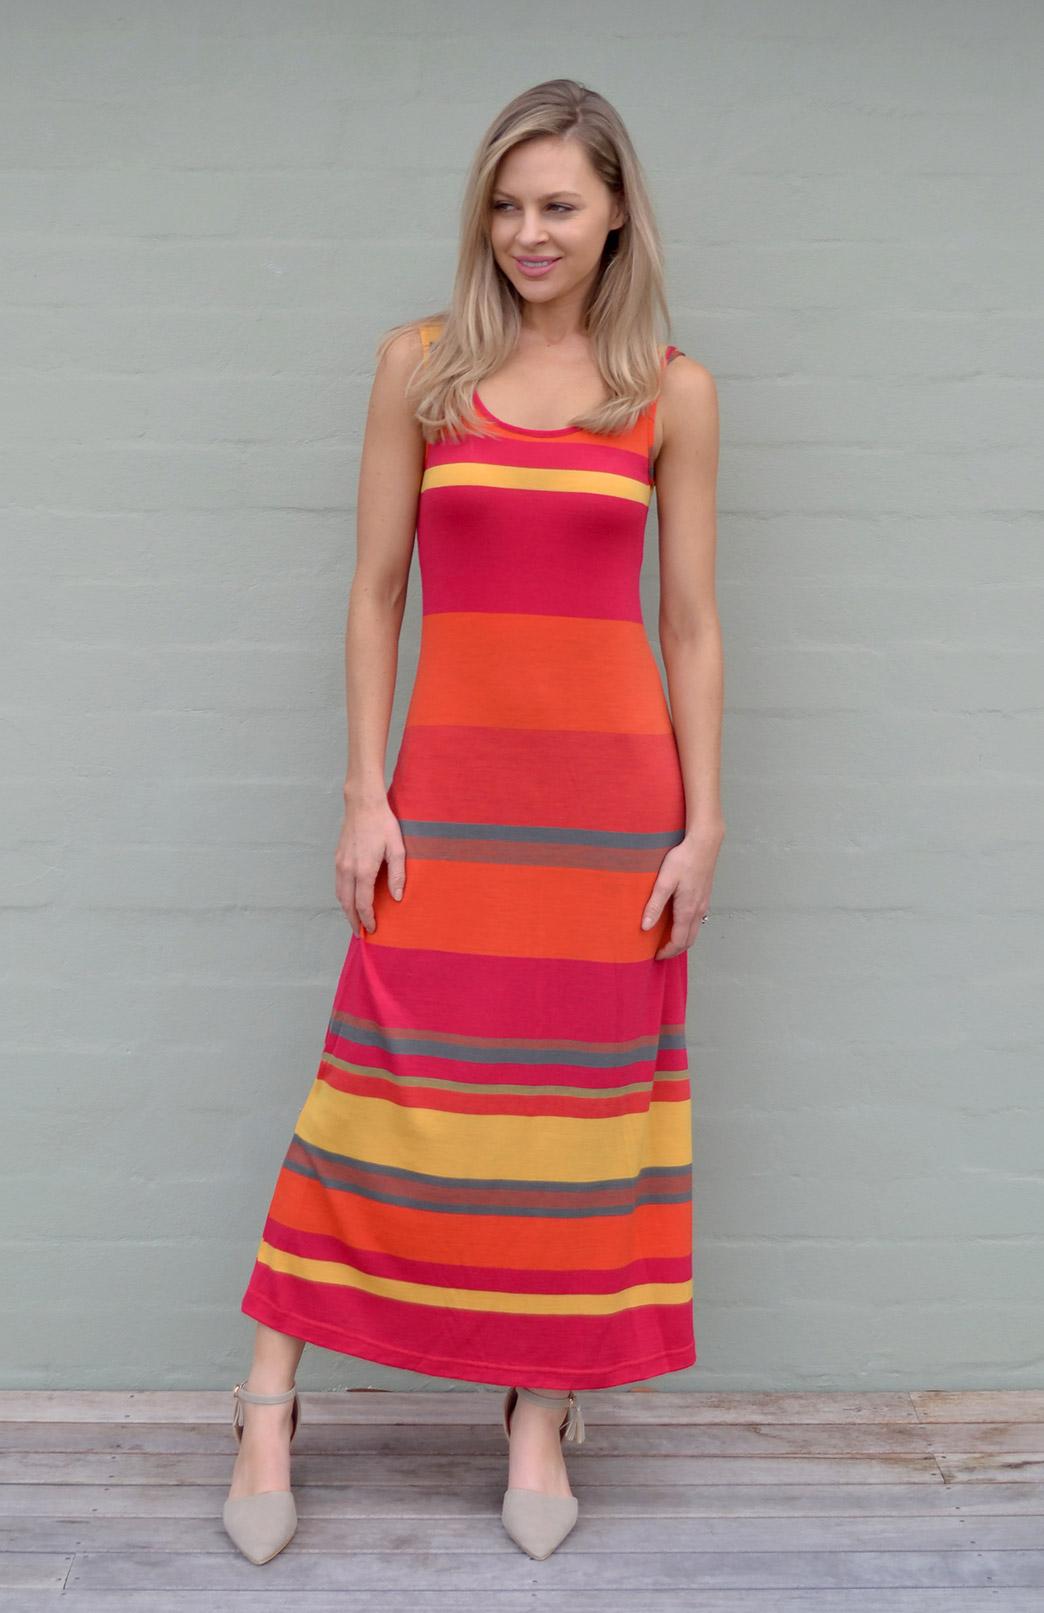 Maxi Dress - Multi Striped - Women's Merino Wool Orange and Yellow Multi Striped Maxi Dress with Scoop Neckline - Smitten Merino Tasmania Australia